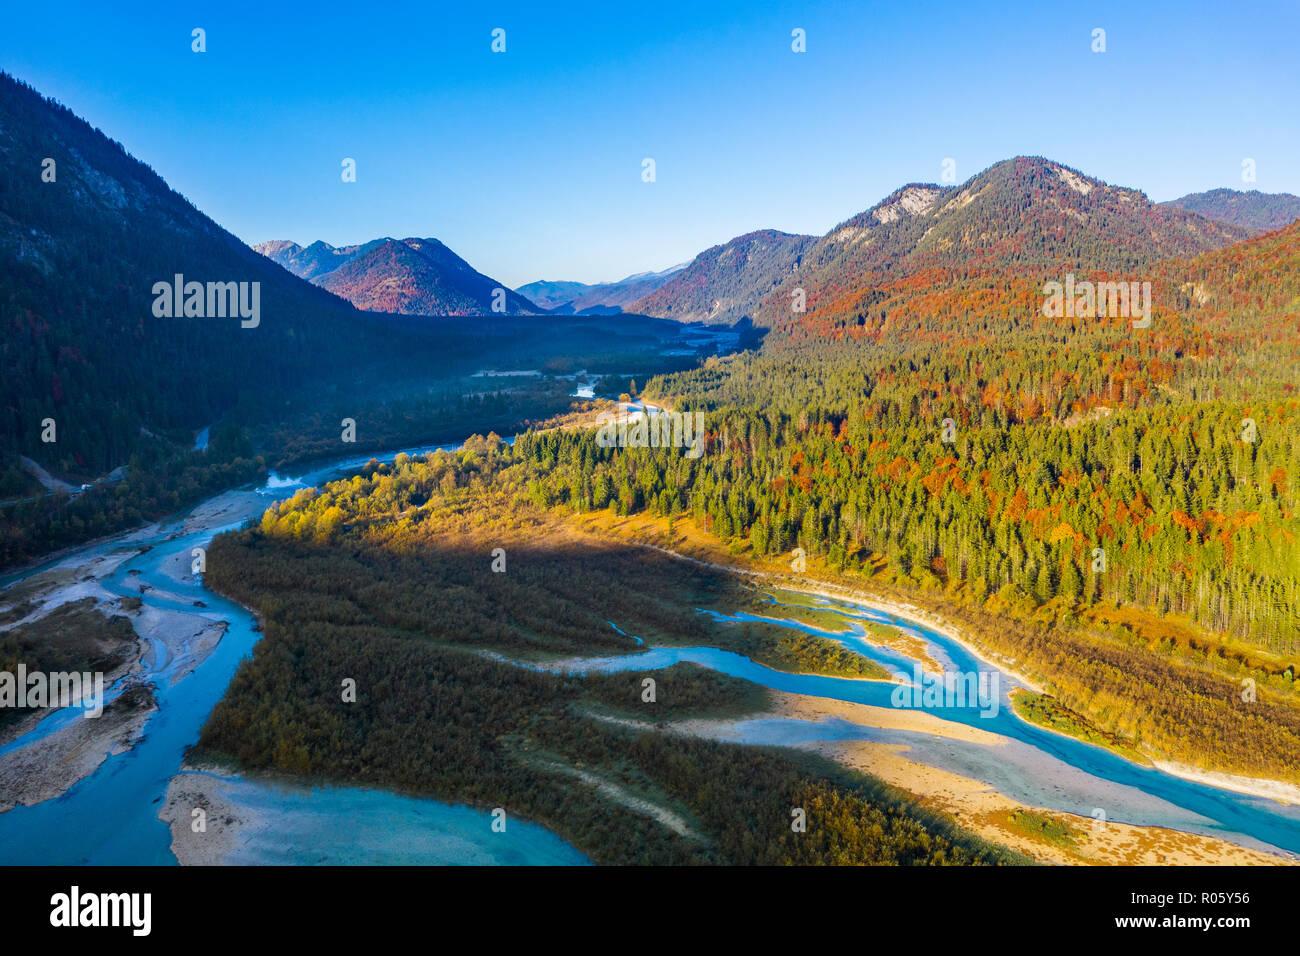 Isar, at the Sylvenstein lake, drone image, Lenggries, Isarwinkel, Upper Bavaria, Bavaria, Germany - Stock Image